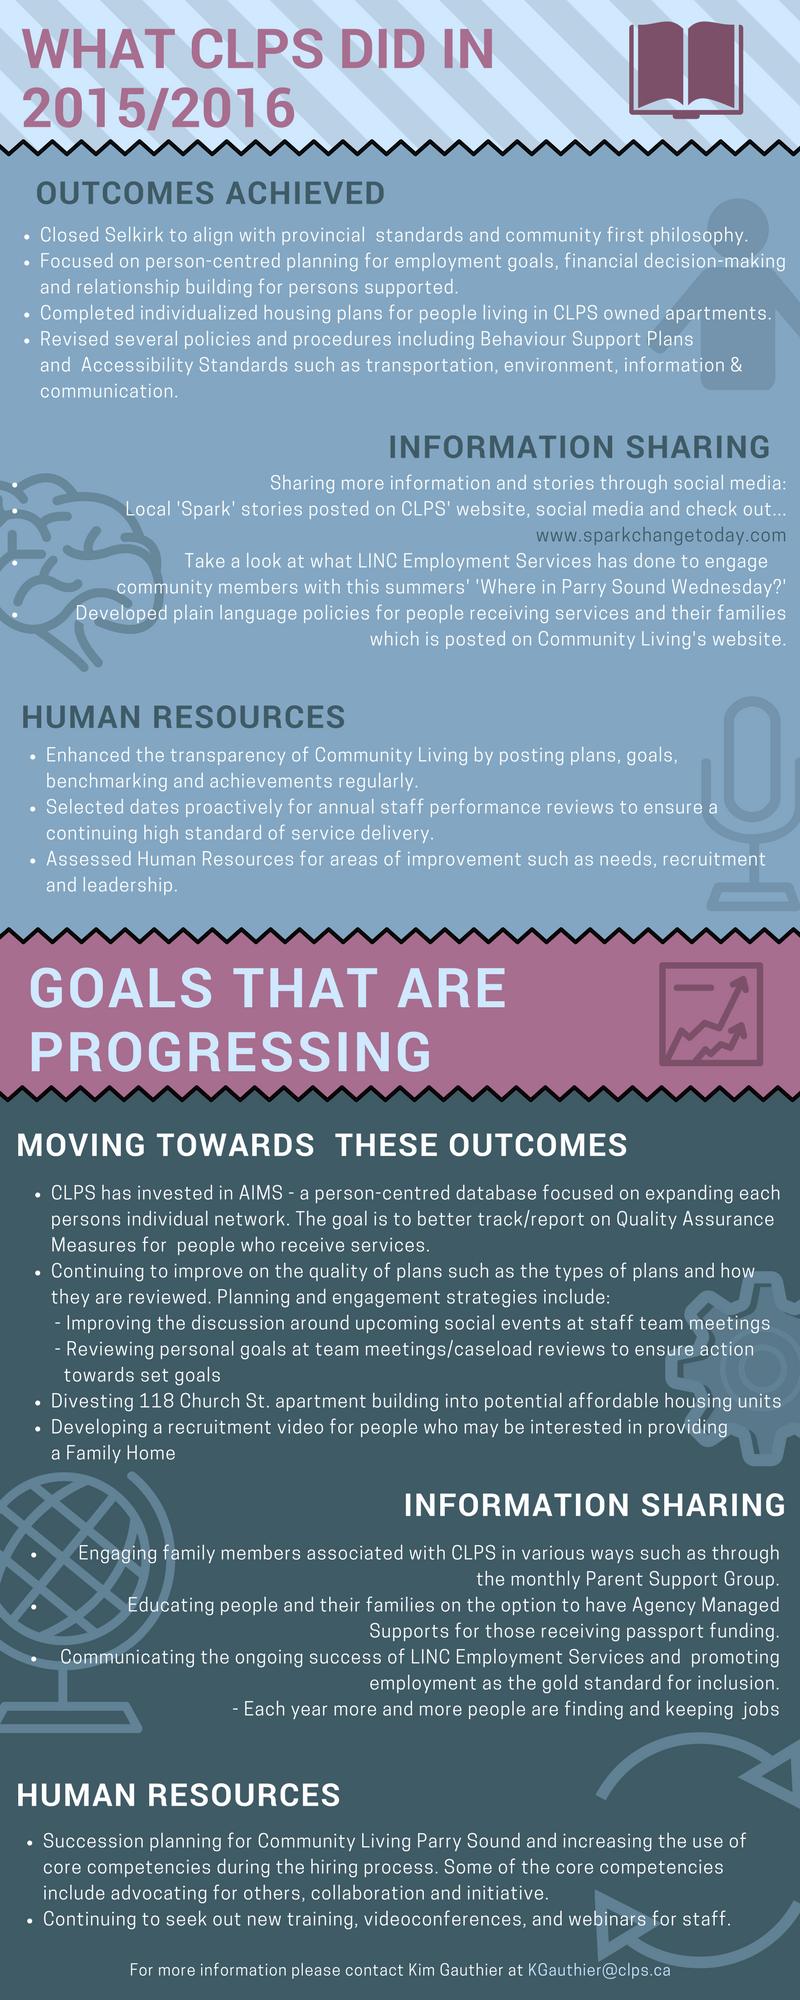 clps-goals-for-2015_2016-1